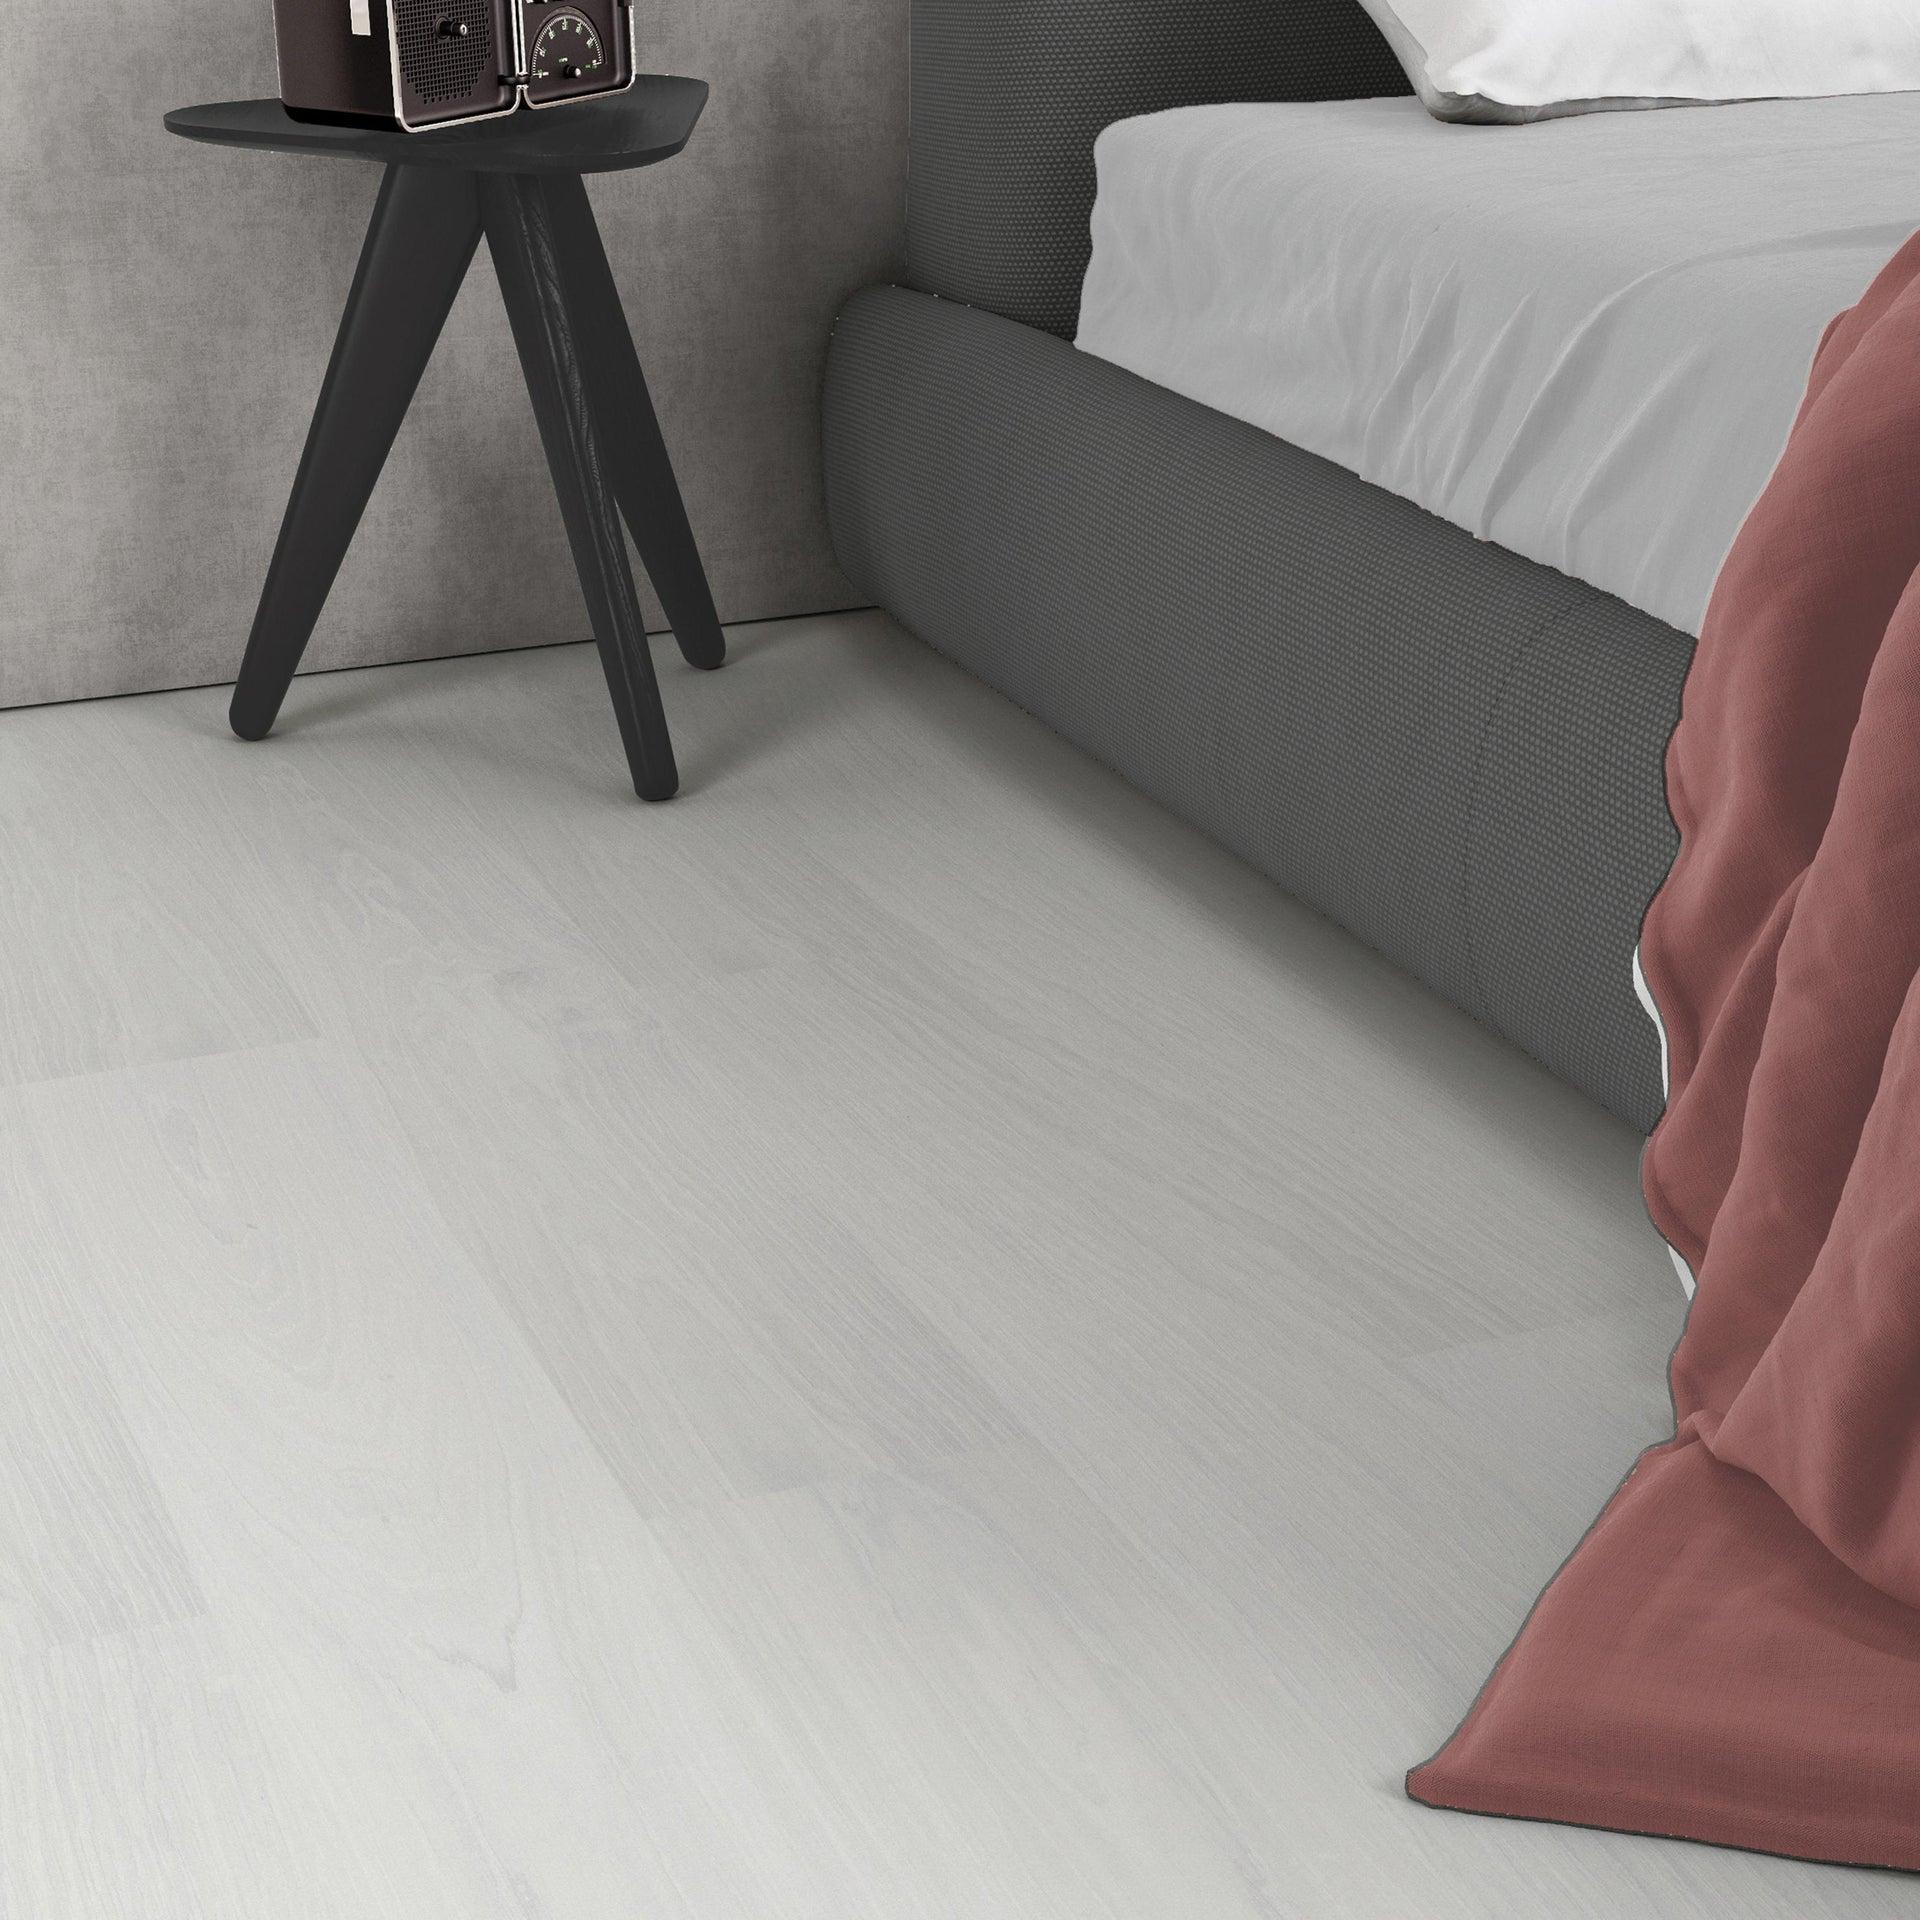 Pavimento laminato Vasa Sp 7 mm bianco - 1